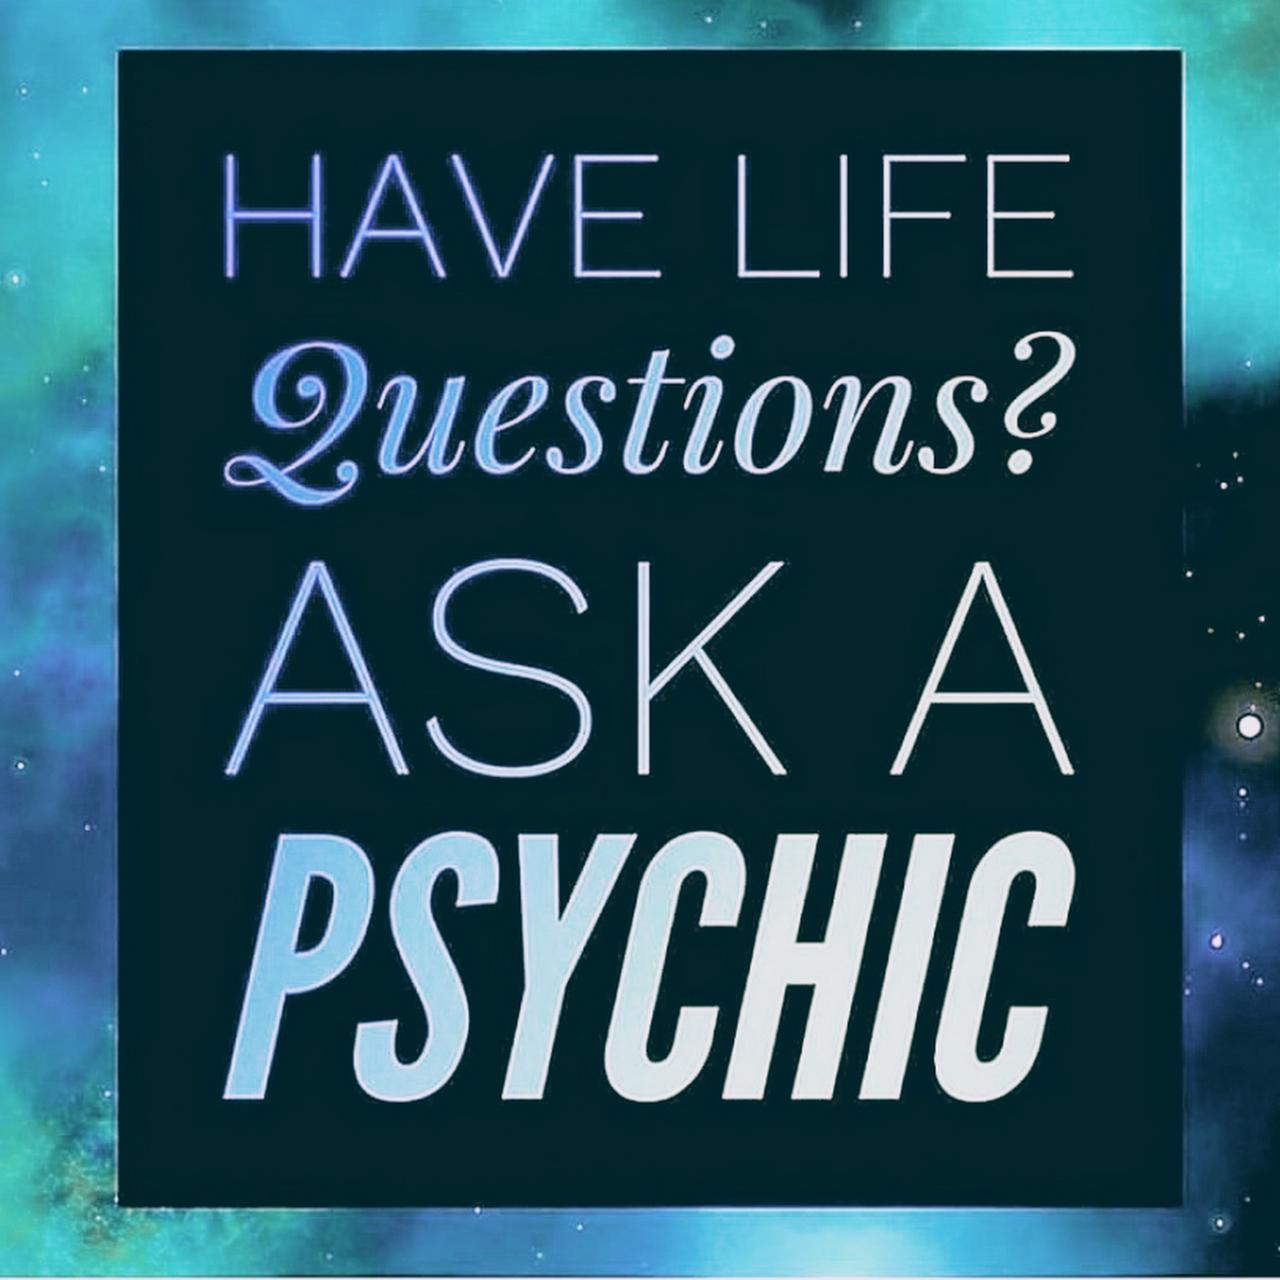 Psychic Reader And Advisor - Psychic in Houston